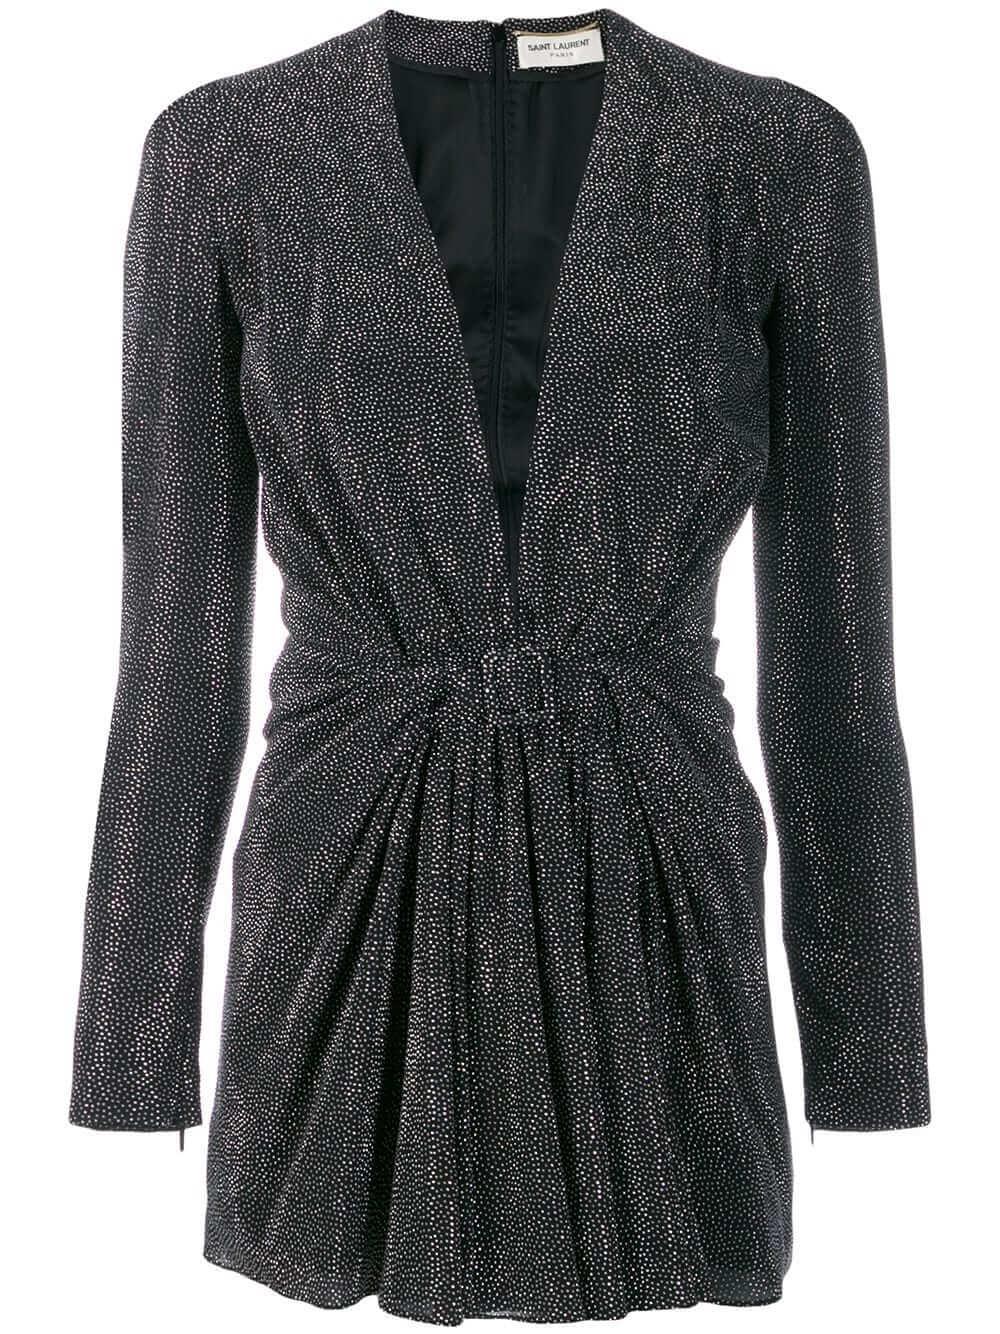 V- Neck Short Dress With Crystals Item # 601143Y4A01